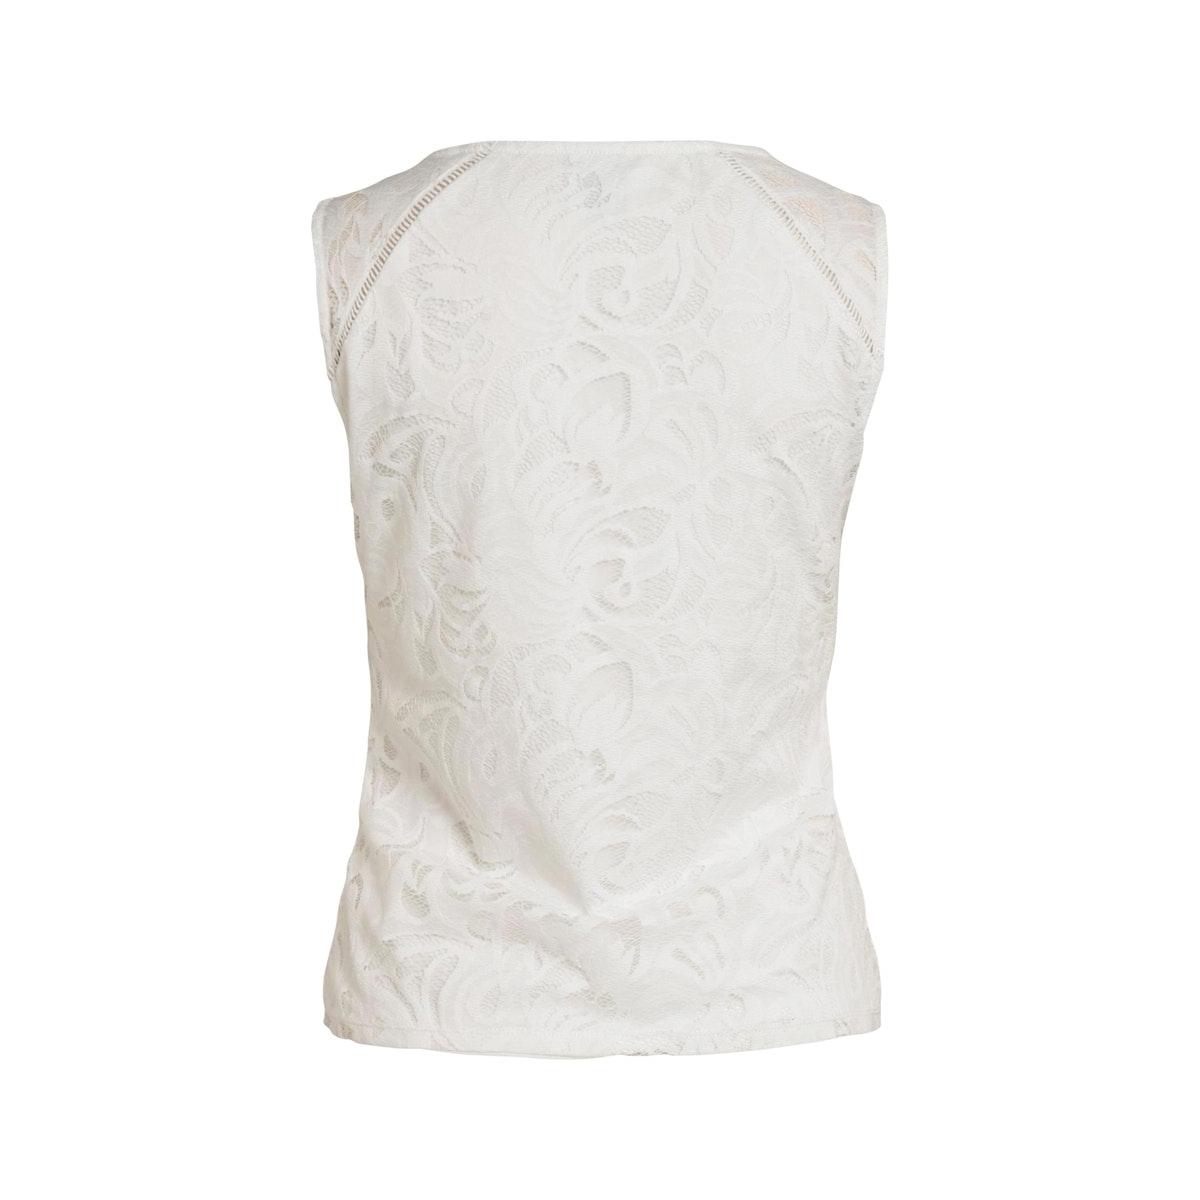 vistasia v-neck lace s/l top-fav nx 14057250 vila top cloud dancer